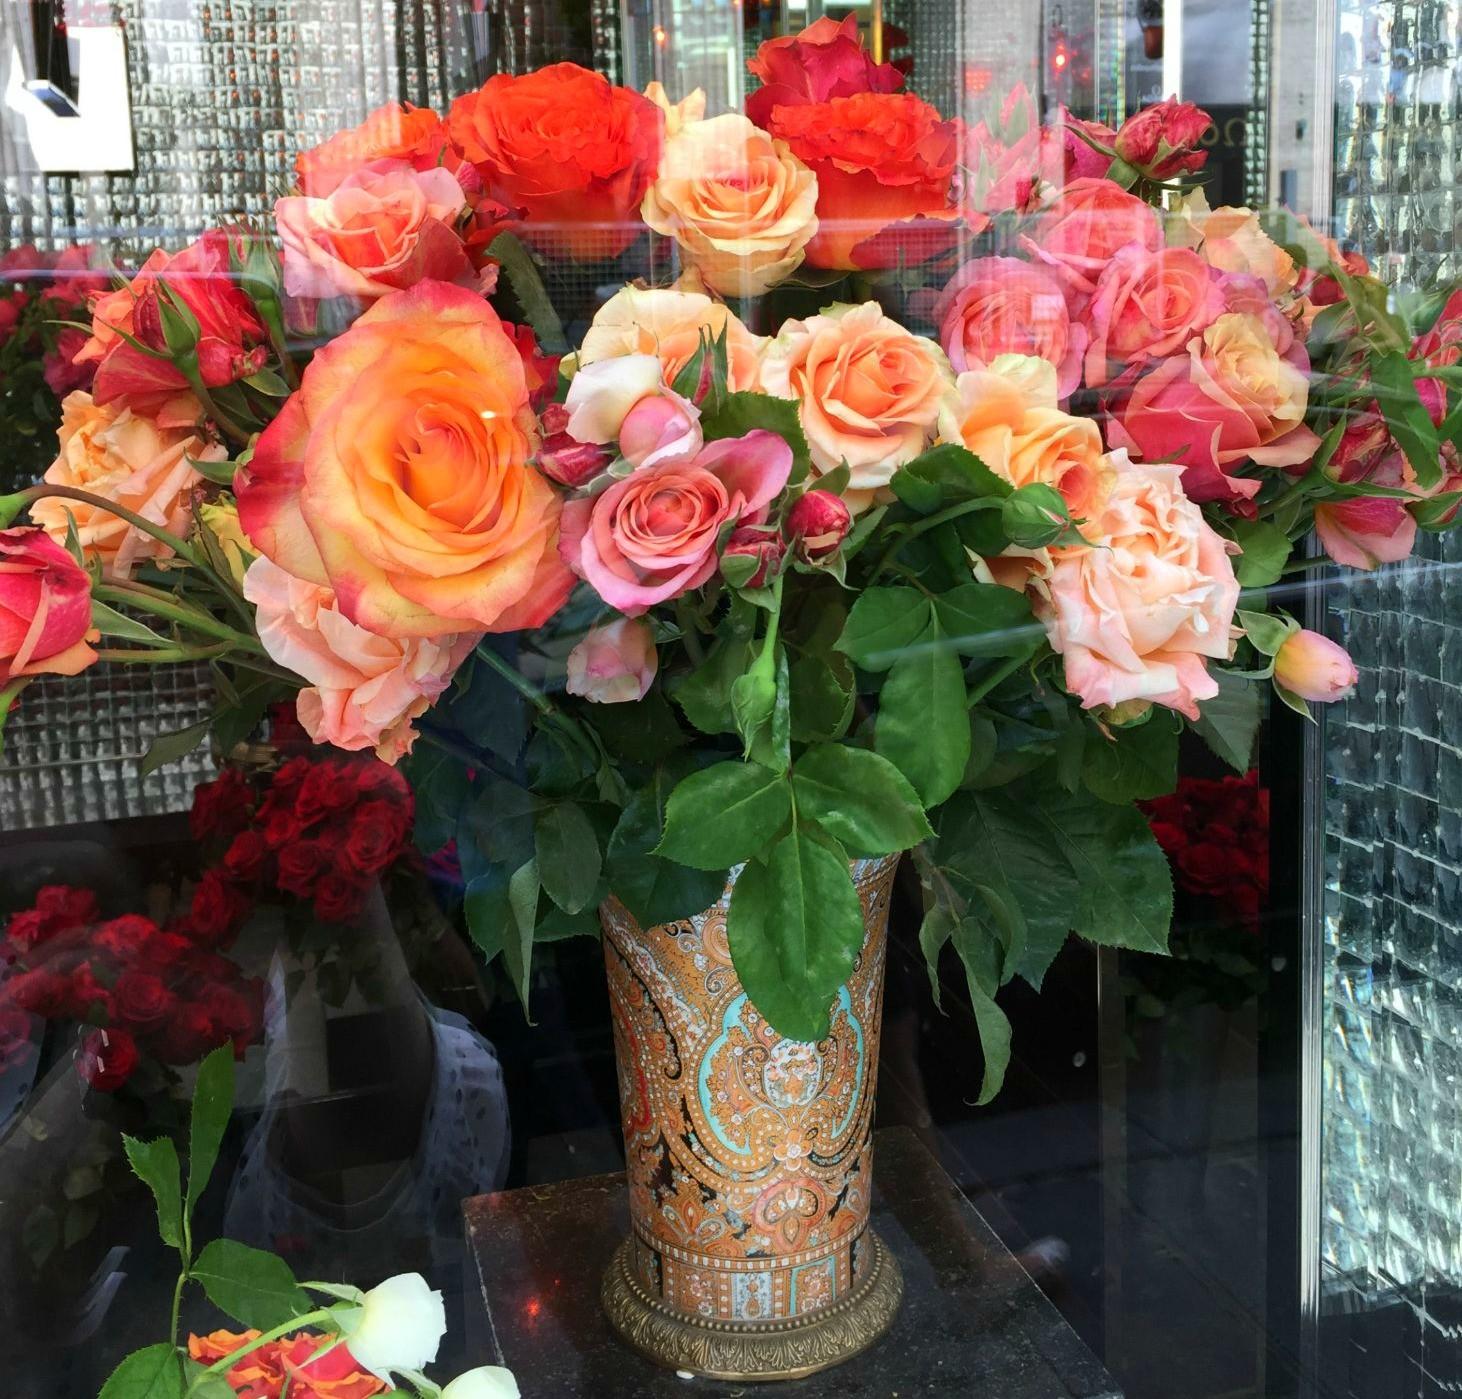 Paris florist